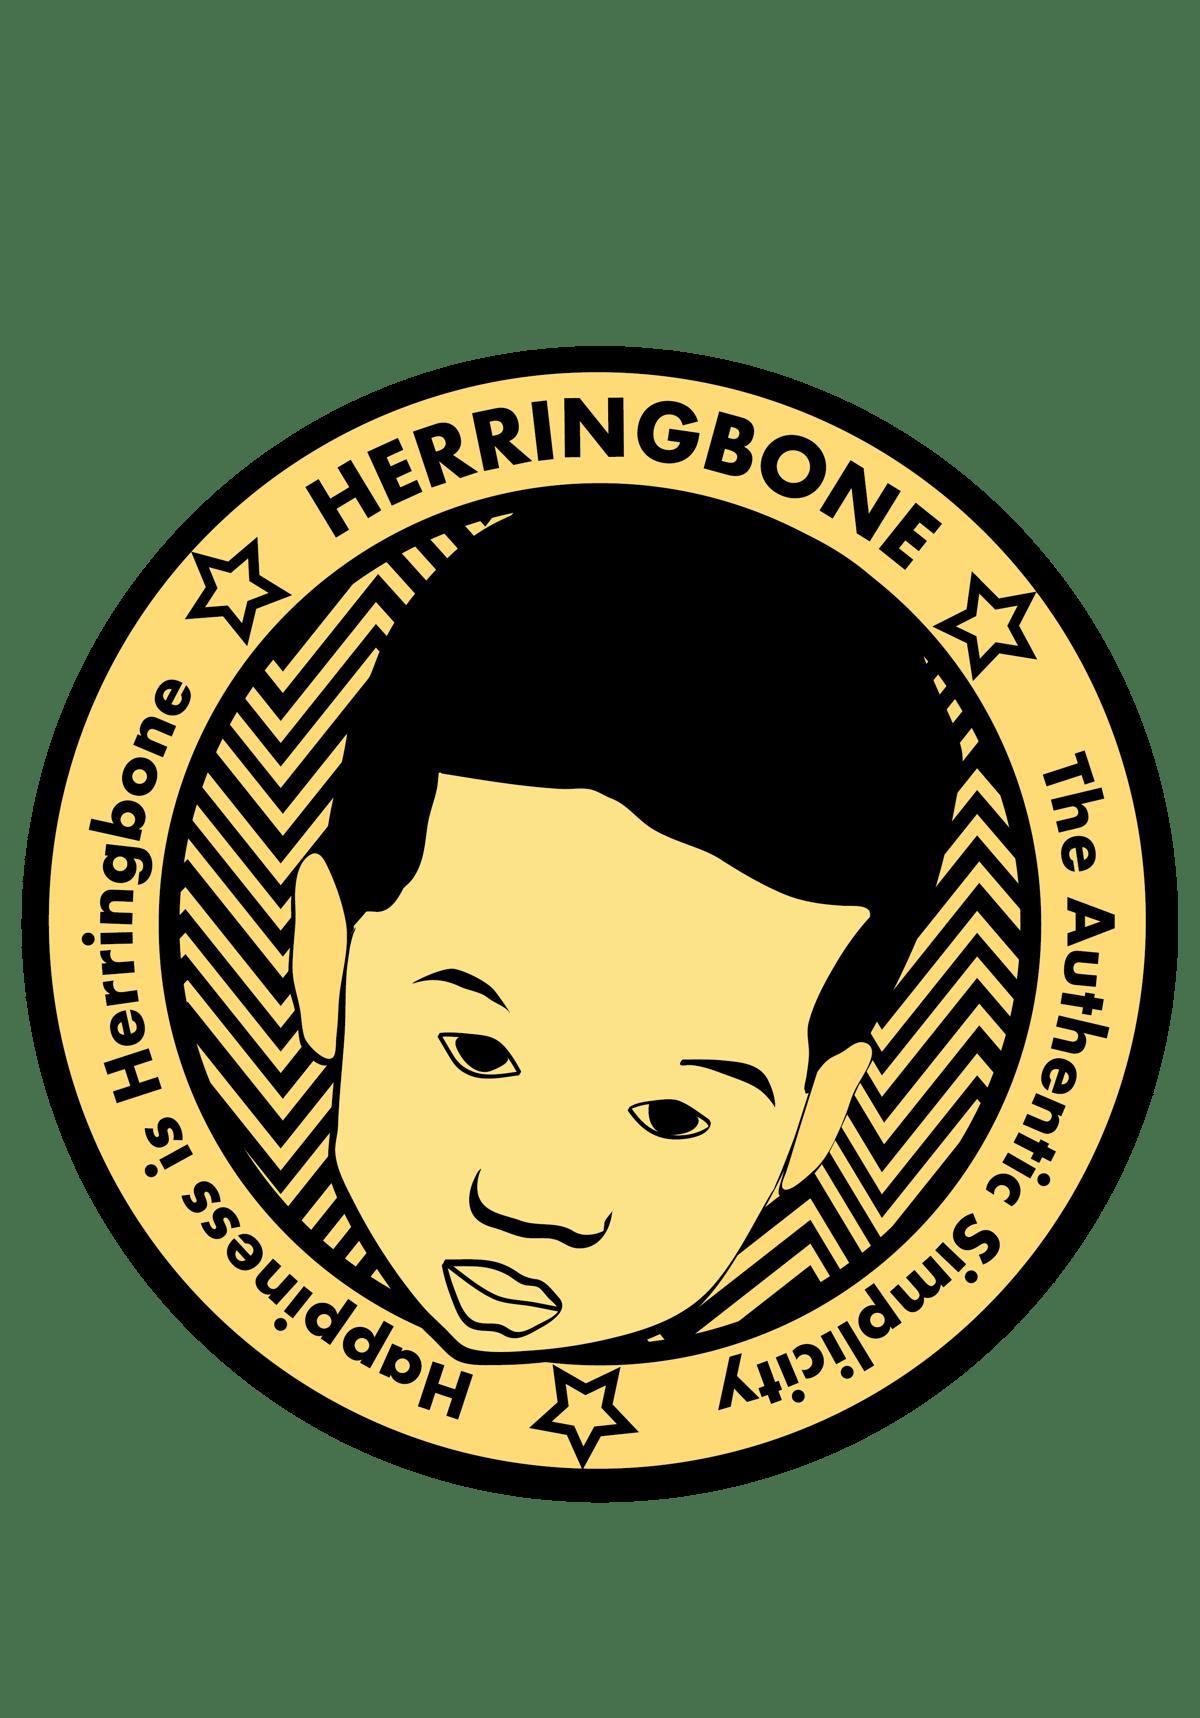 Image of Herringbone